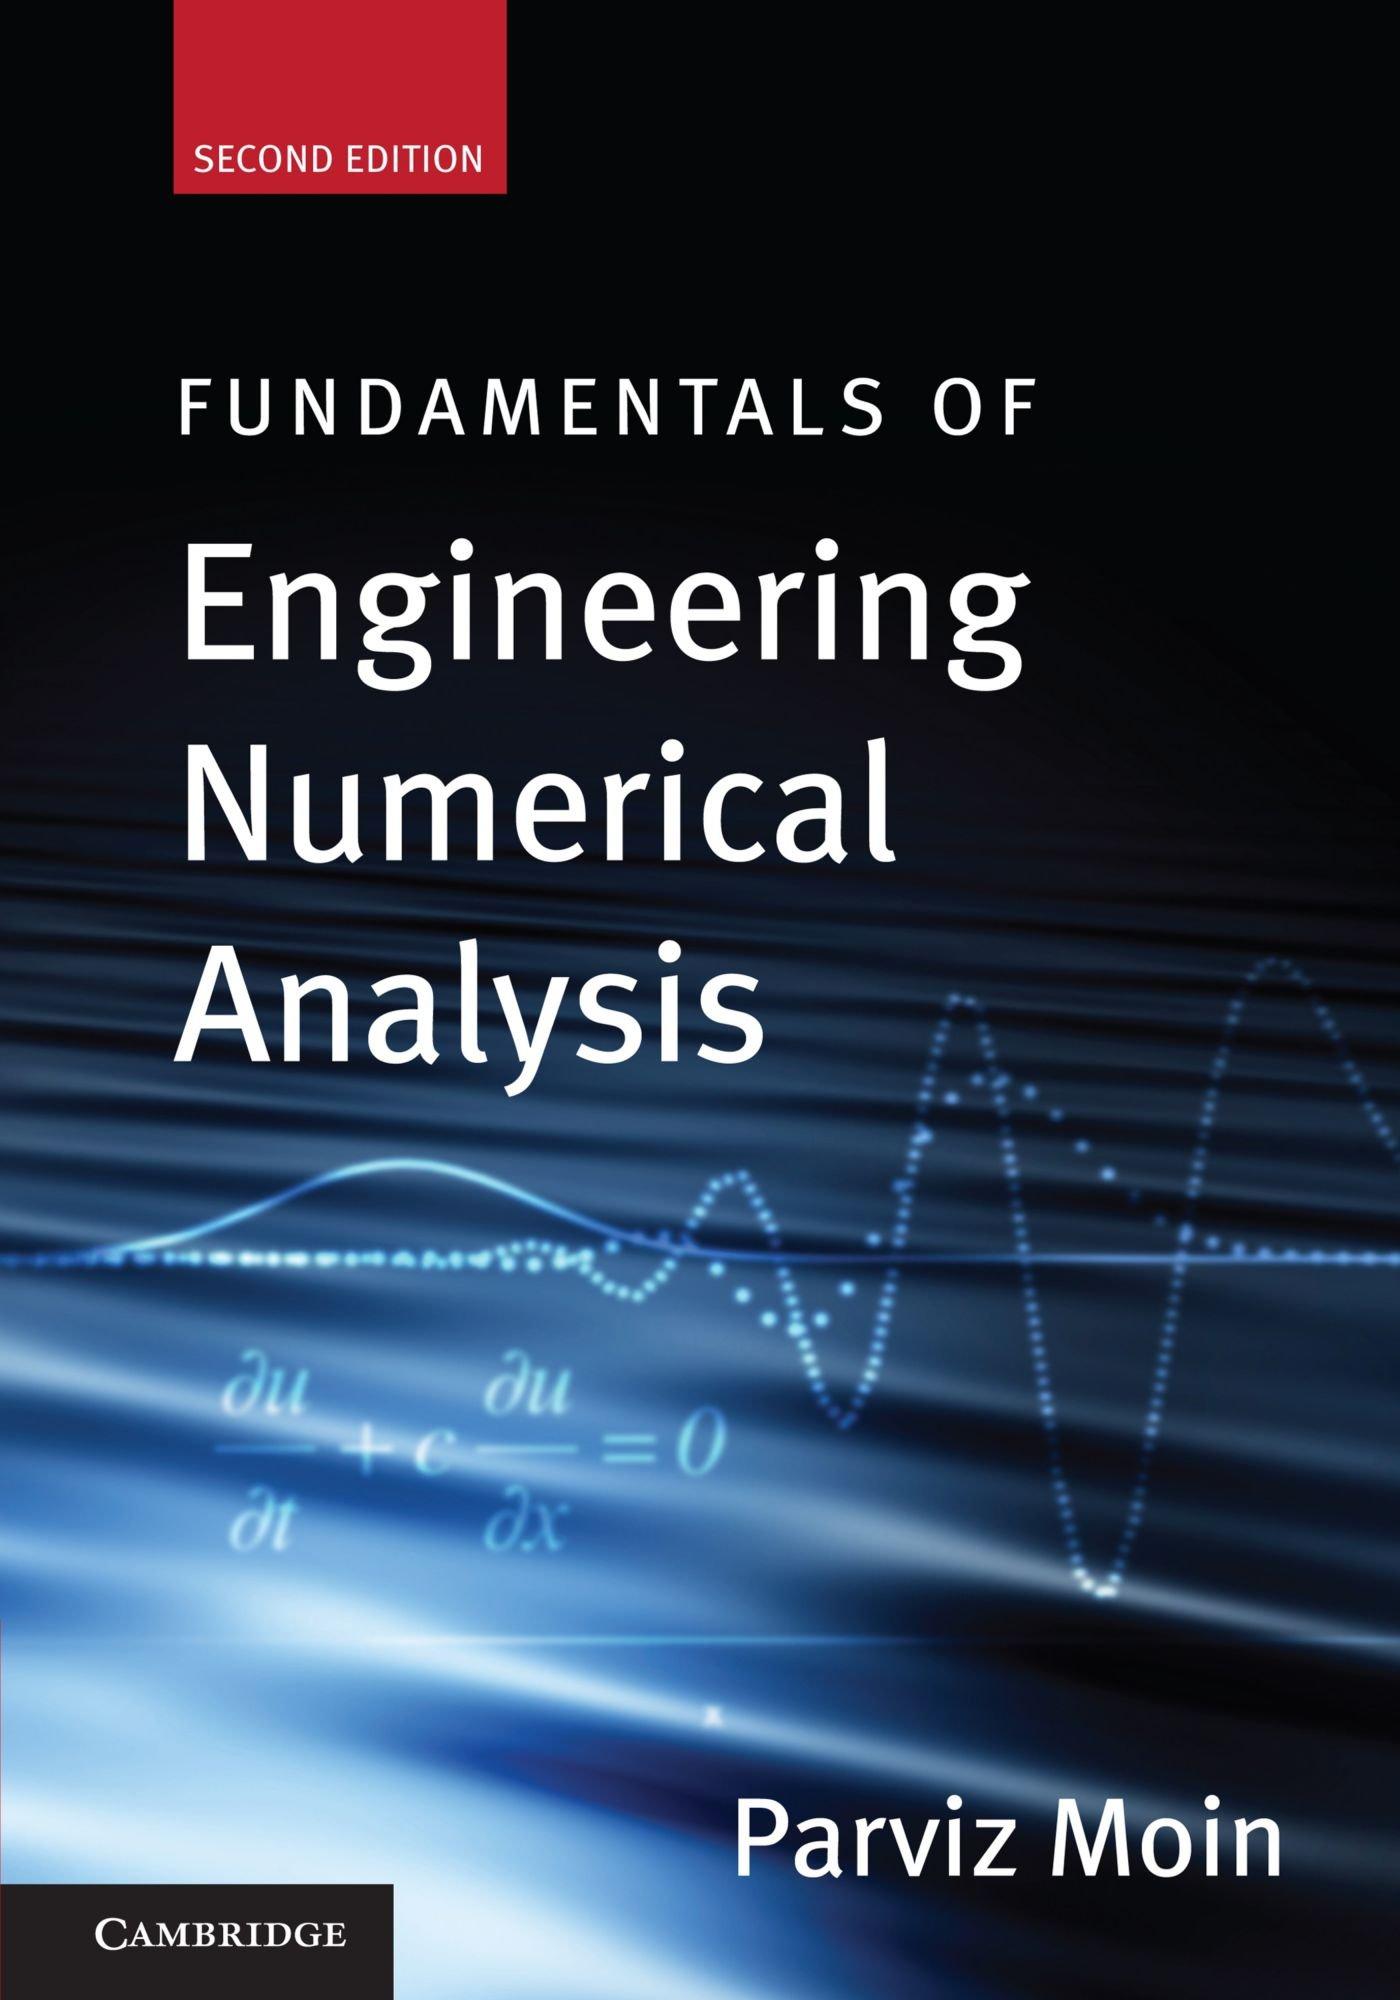 Fundamentals of Engineering Numerical Analysis: Parviz Moin: 9780521711234:  Books - Amazon.ca